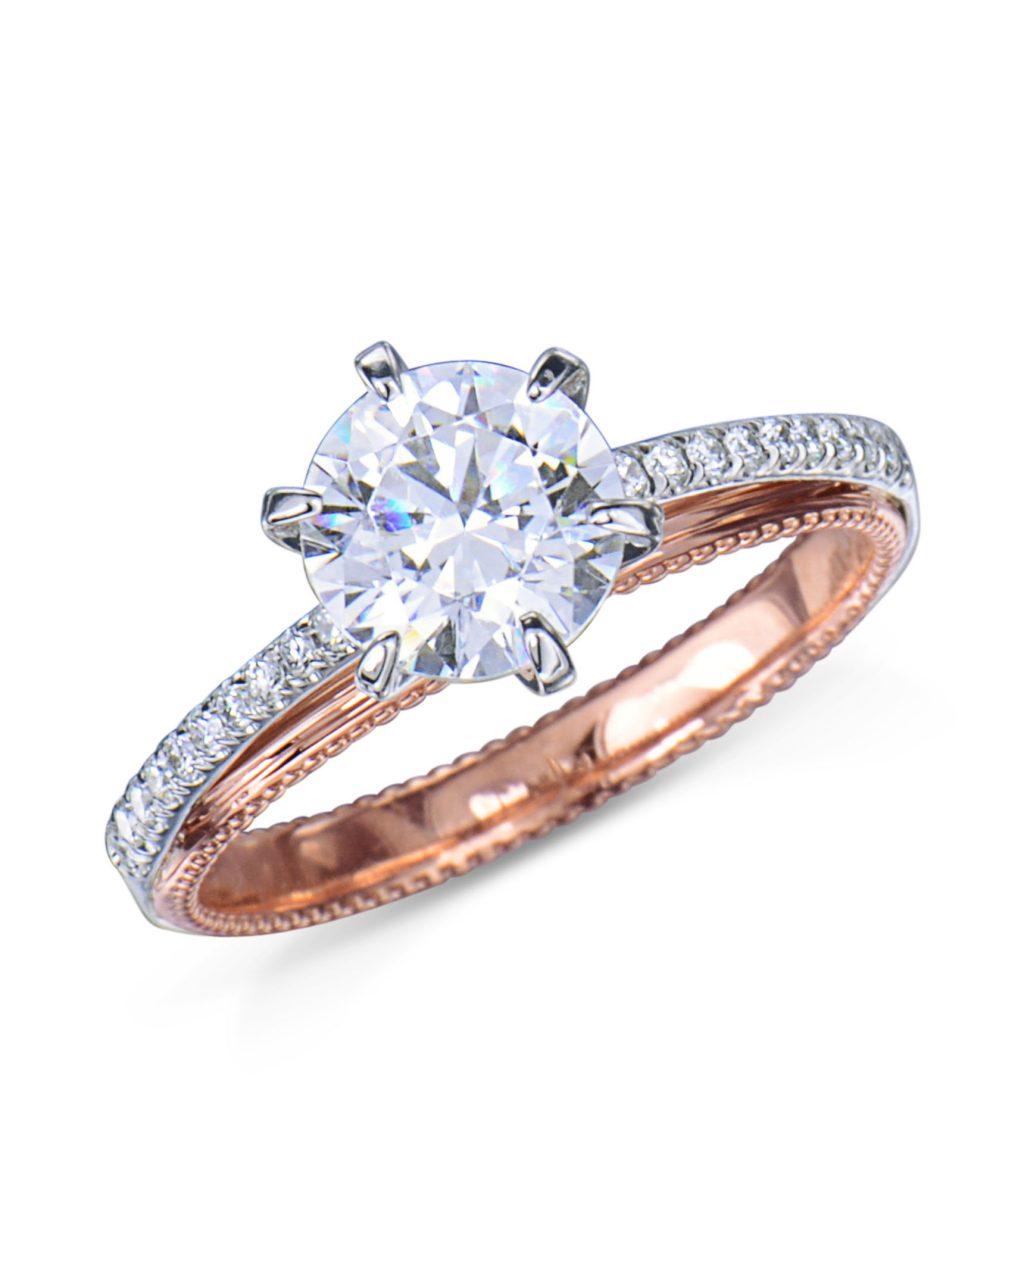 Rose Gold And Platinum Diamond Engagement Ring